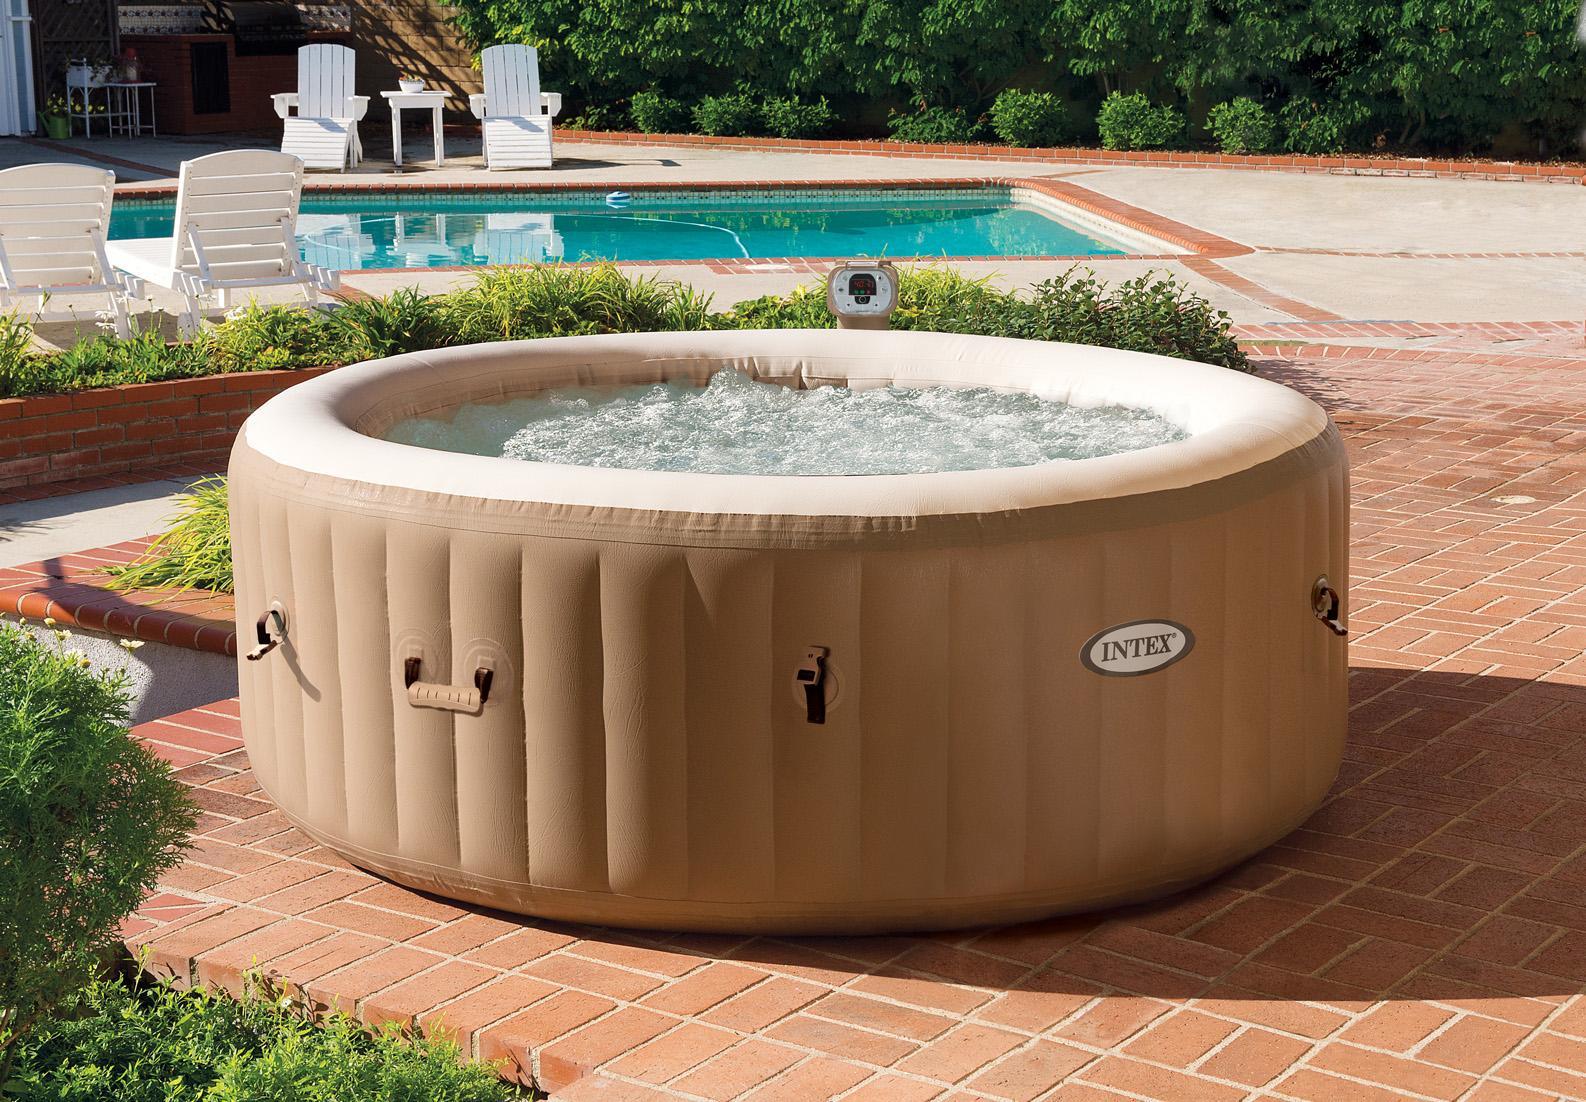 intex 77in purespa portable bubble massage spa set patio lawn garden. Black Bedroom Furniture Sets. Home Design Ideas